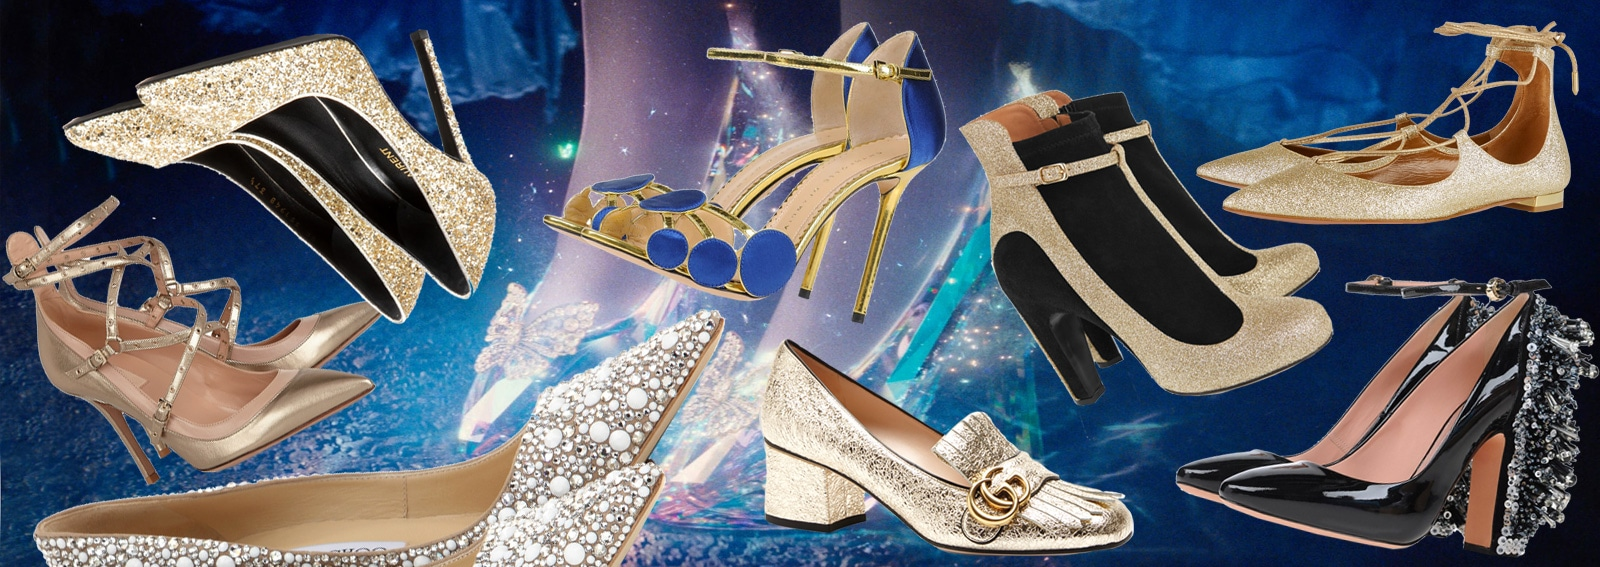 cover scarpe feste 2015 desktop